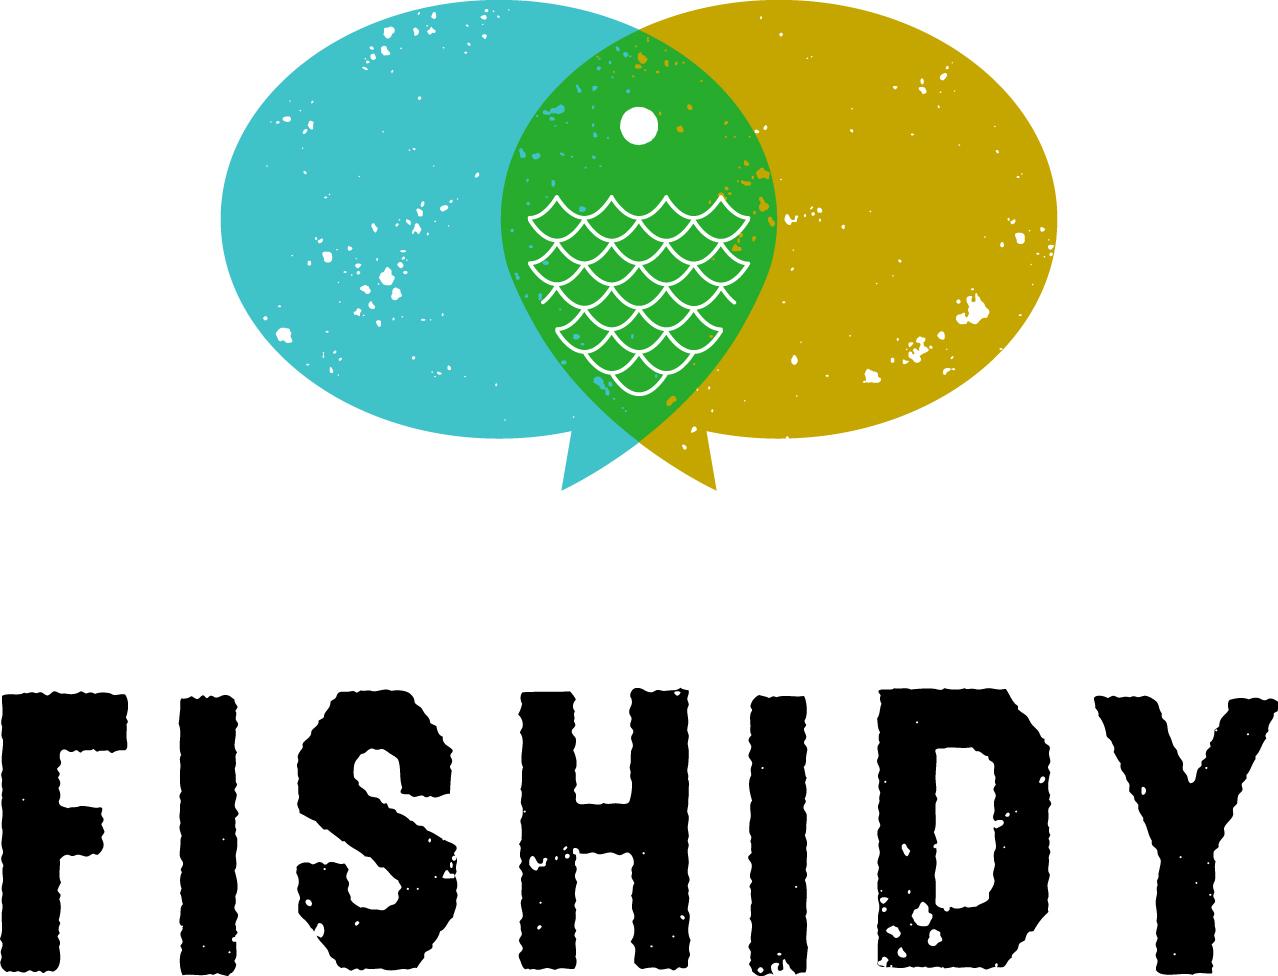 Fishidy : Brian Jenson